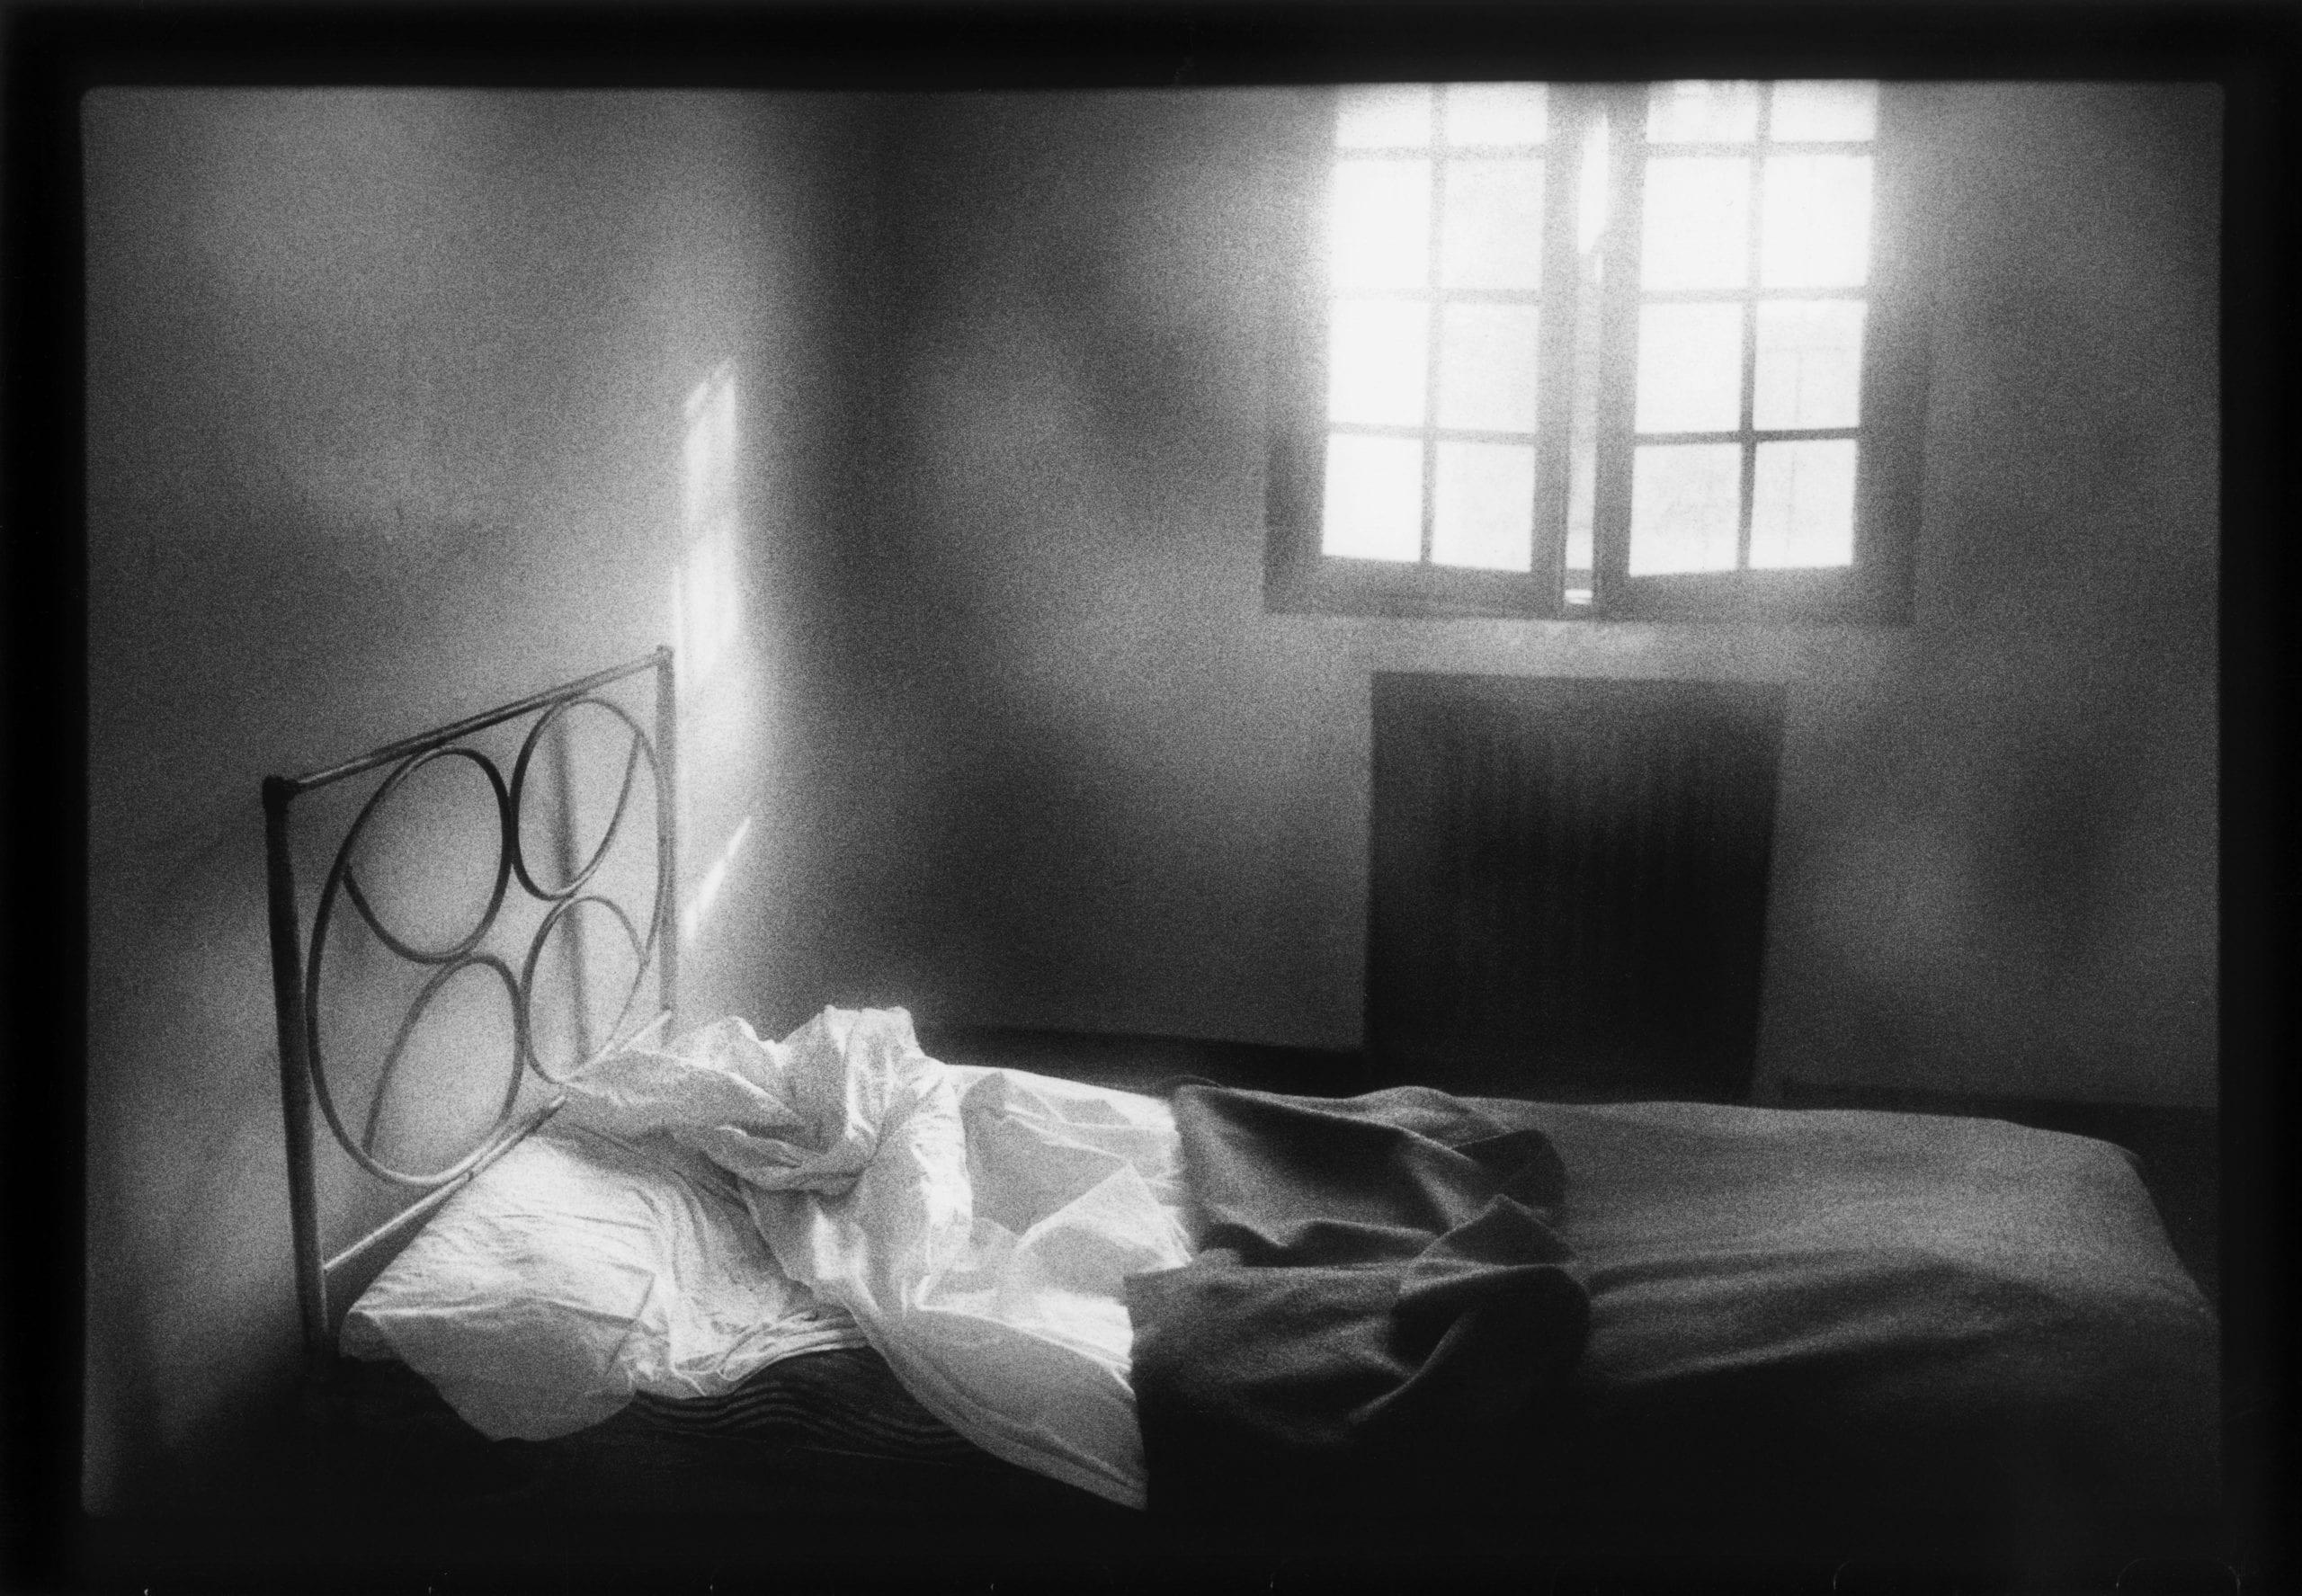 San Clemente psychiatric hospital, Venice. 1979 © Raymond Depardon/Magnum Photos